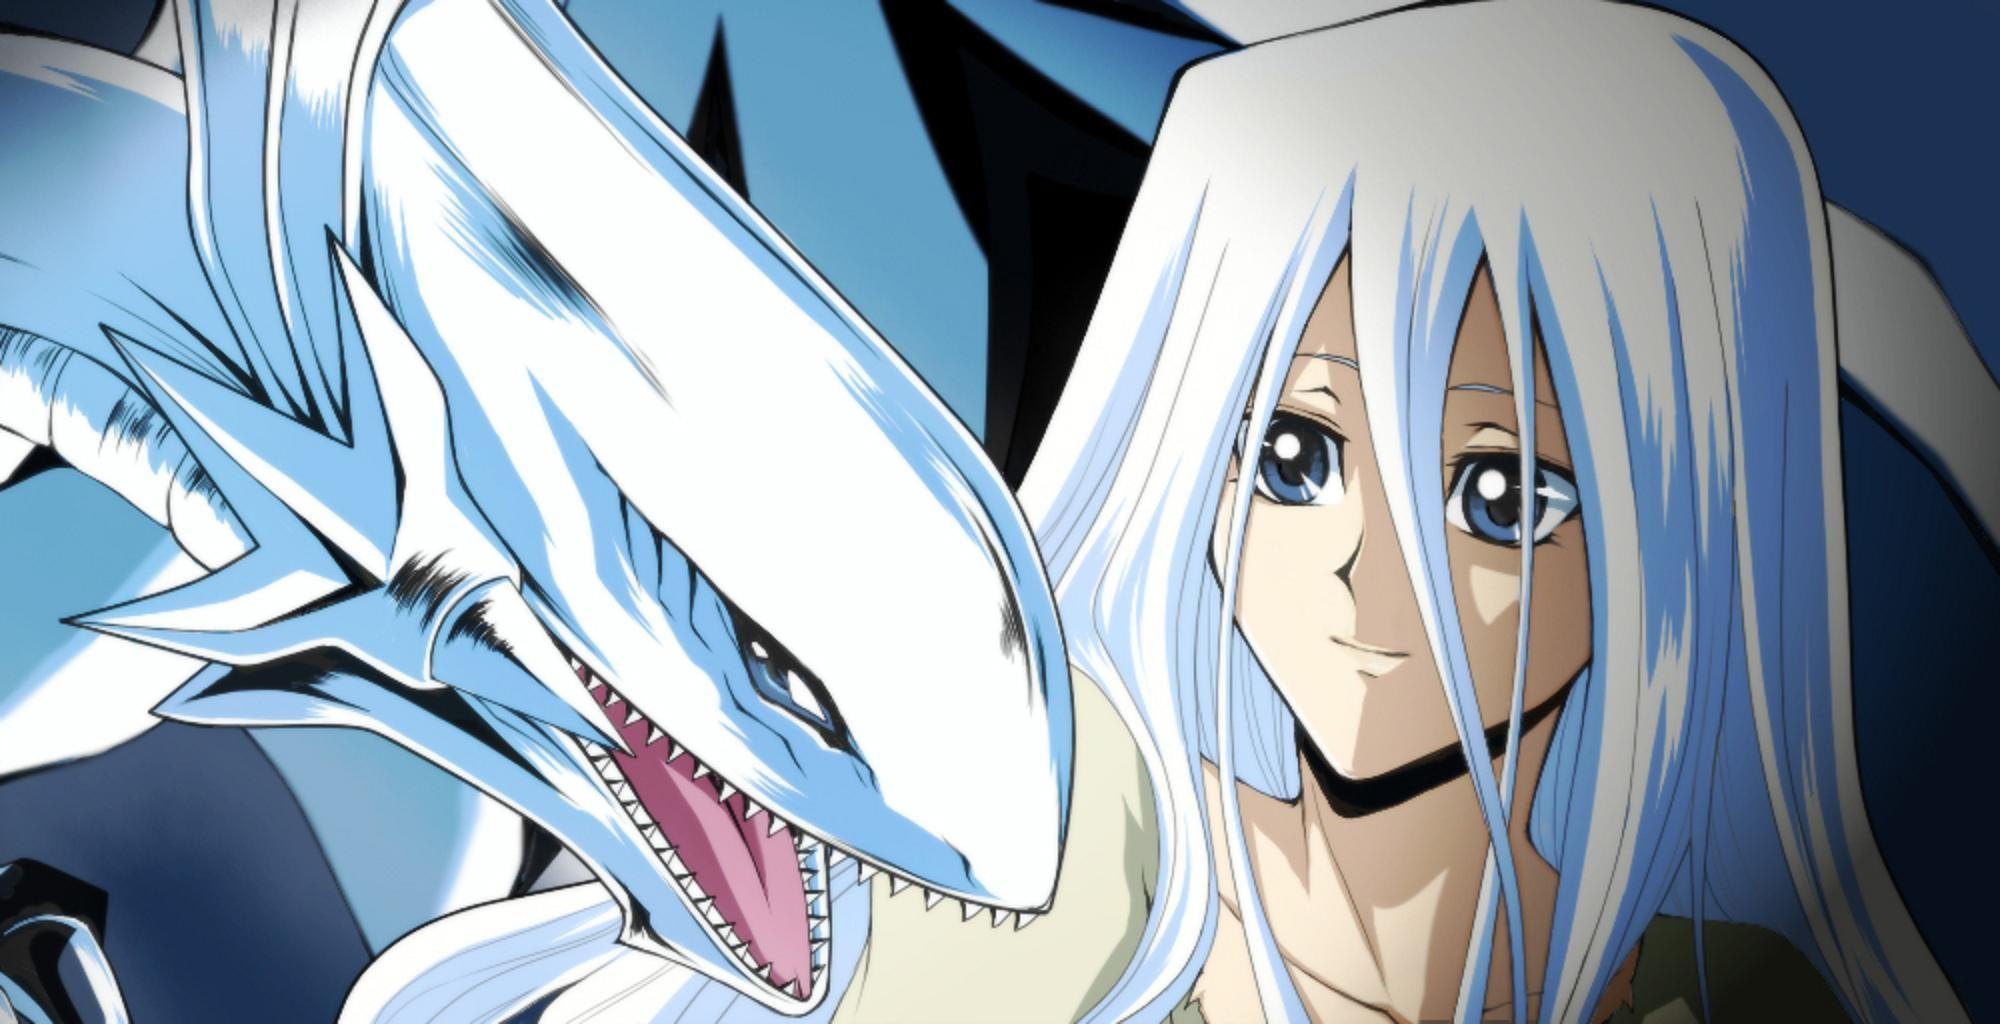 Blue Eyes White Dragon Wallpaper Http Wallpaperzoo Com Blue